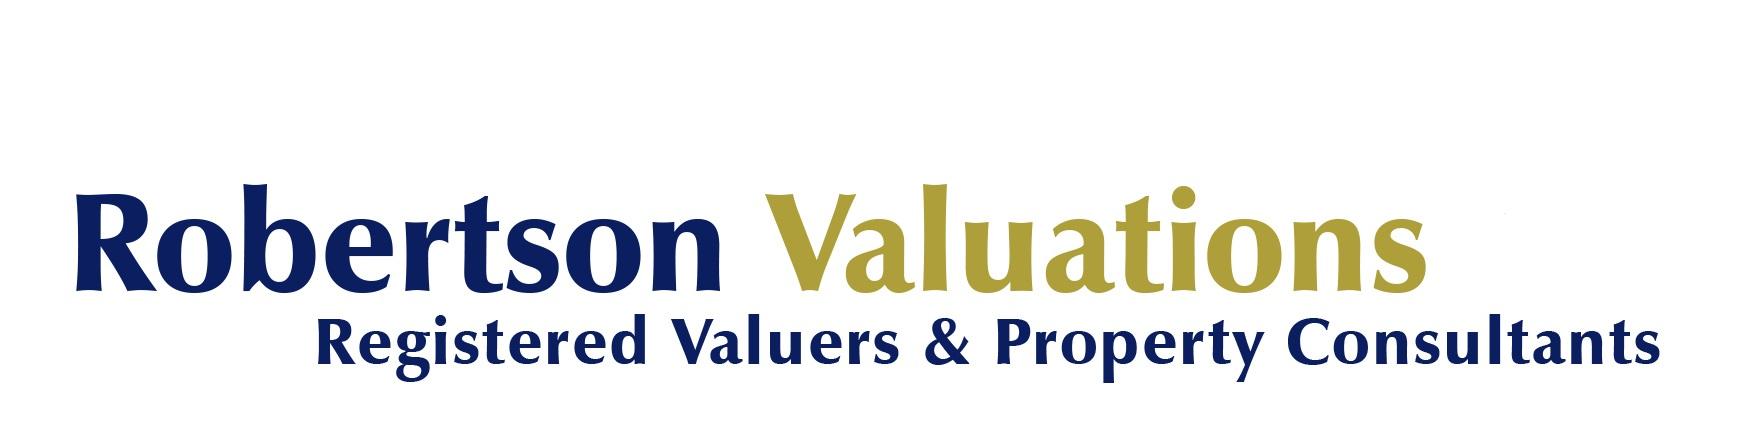 Robertson Valuations